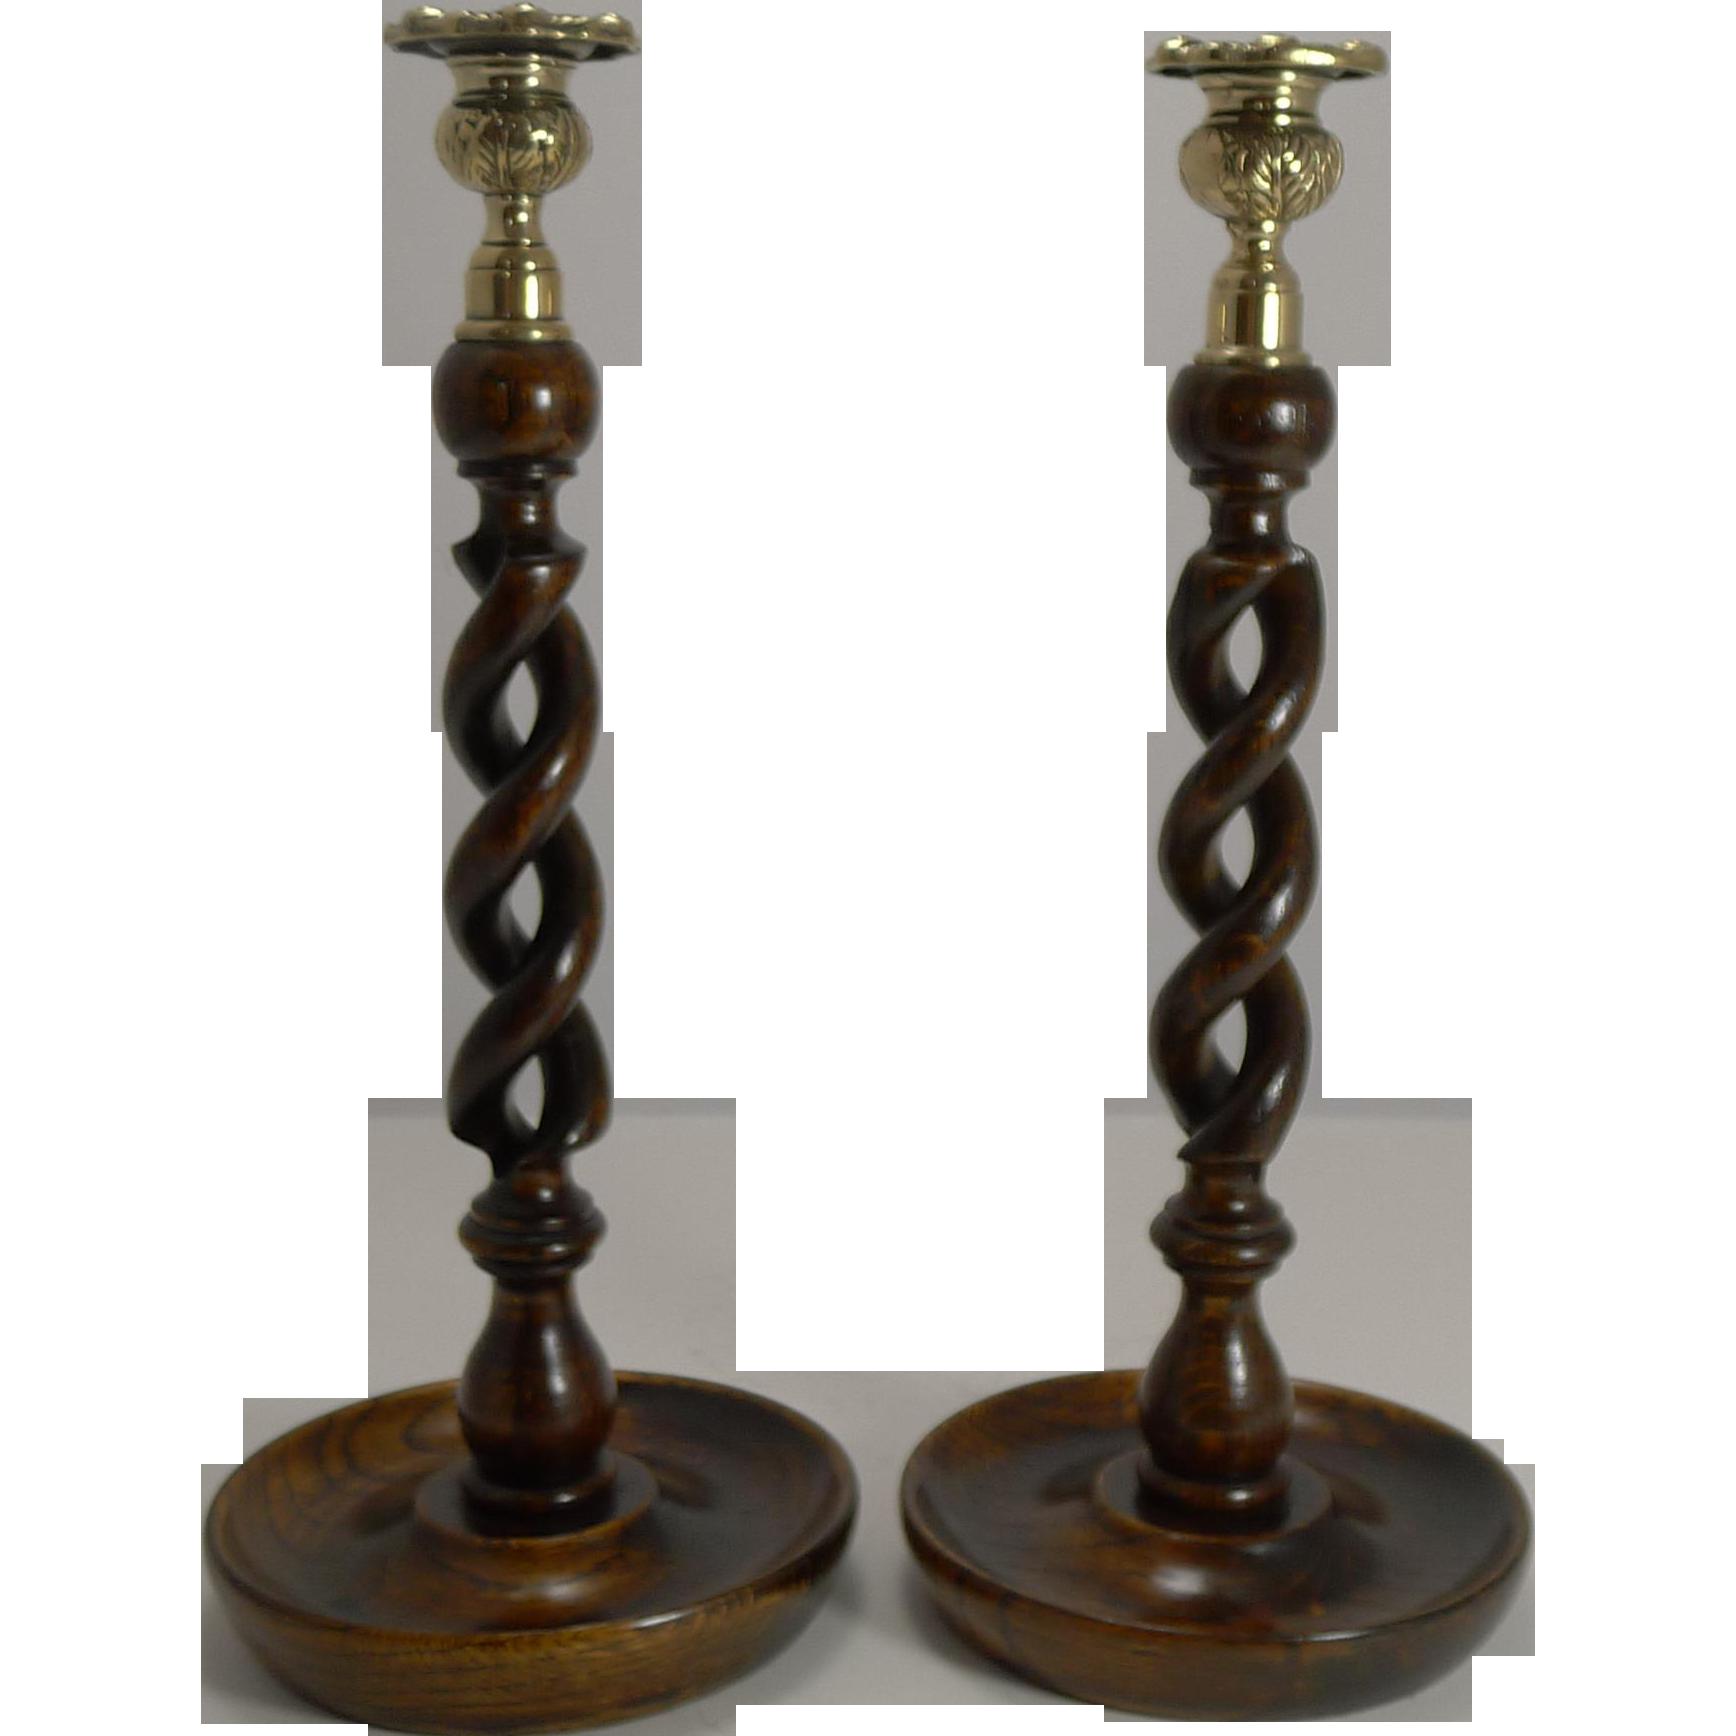 "Towering Pair 14"" Solid Oak Open Barley Twist Candlesticks - Brass Tops"